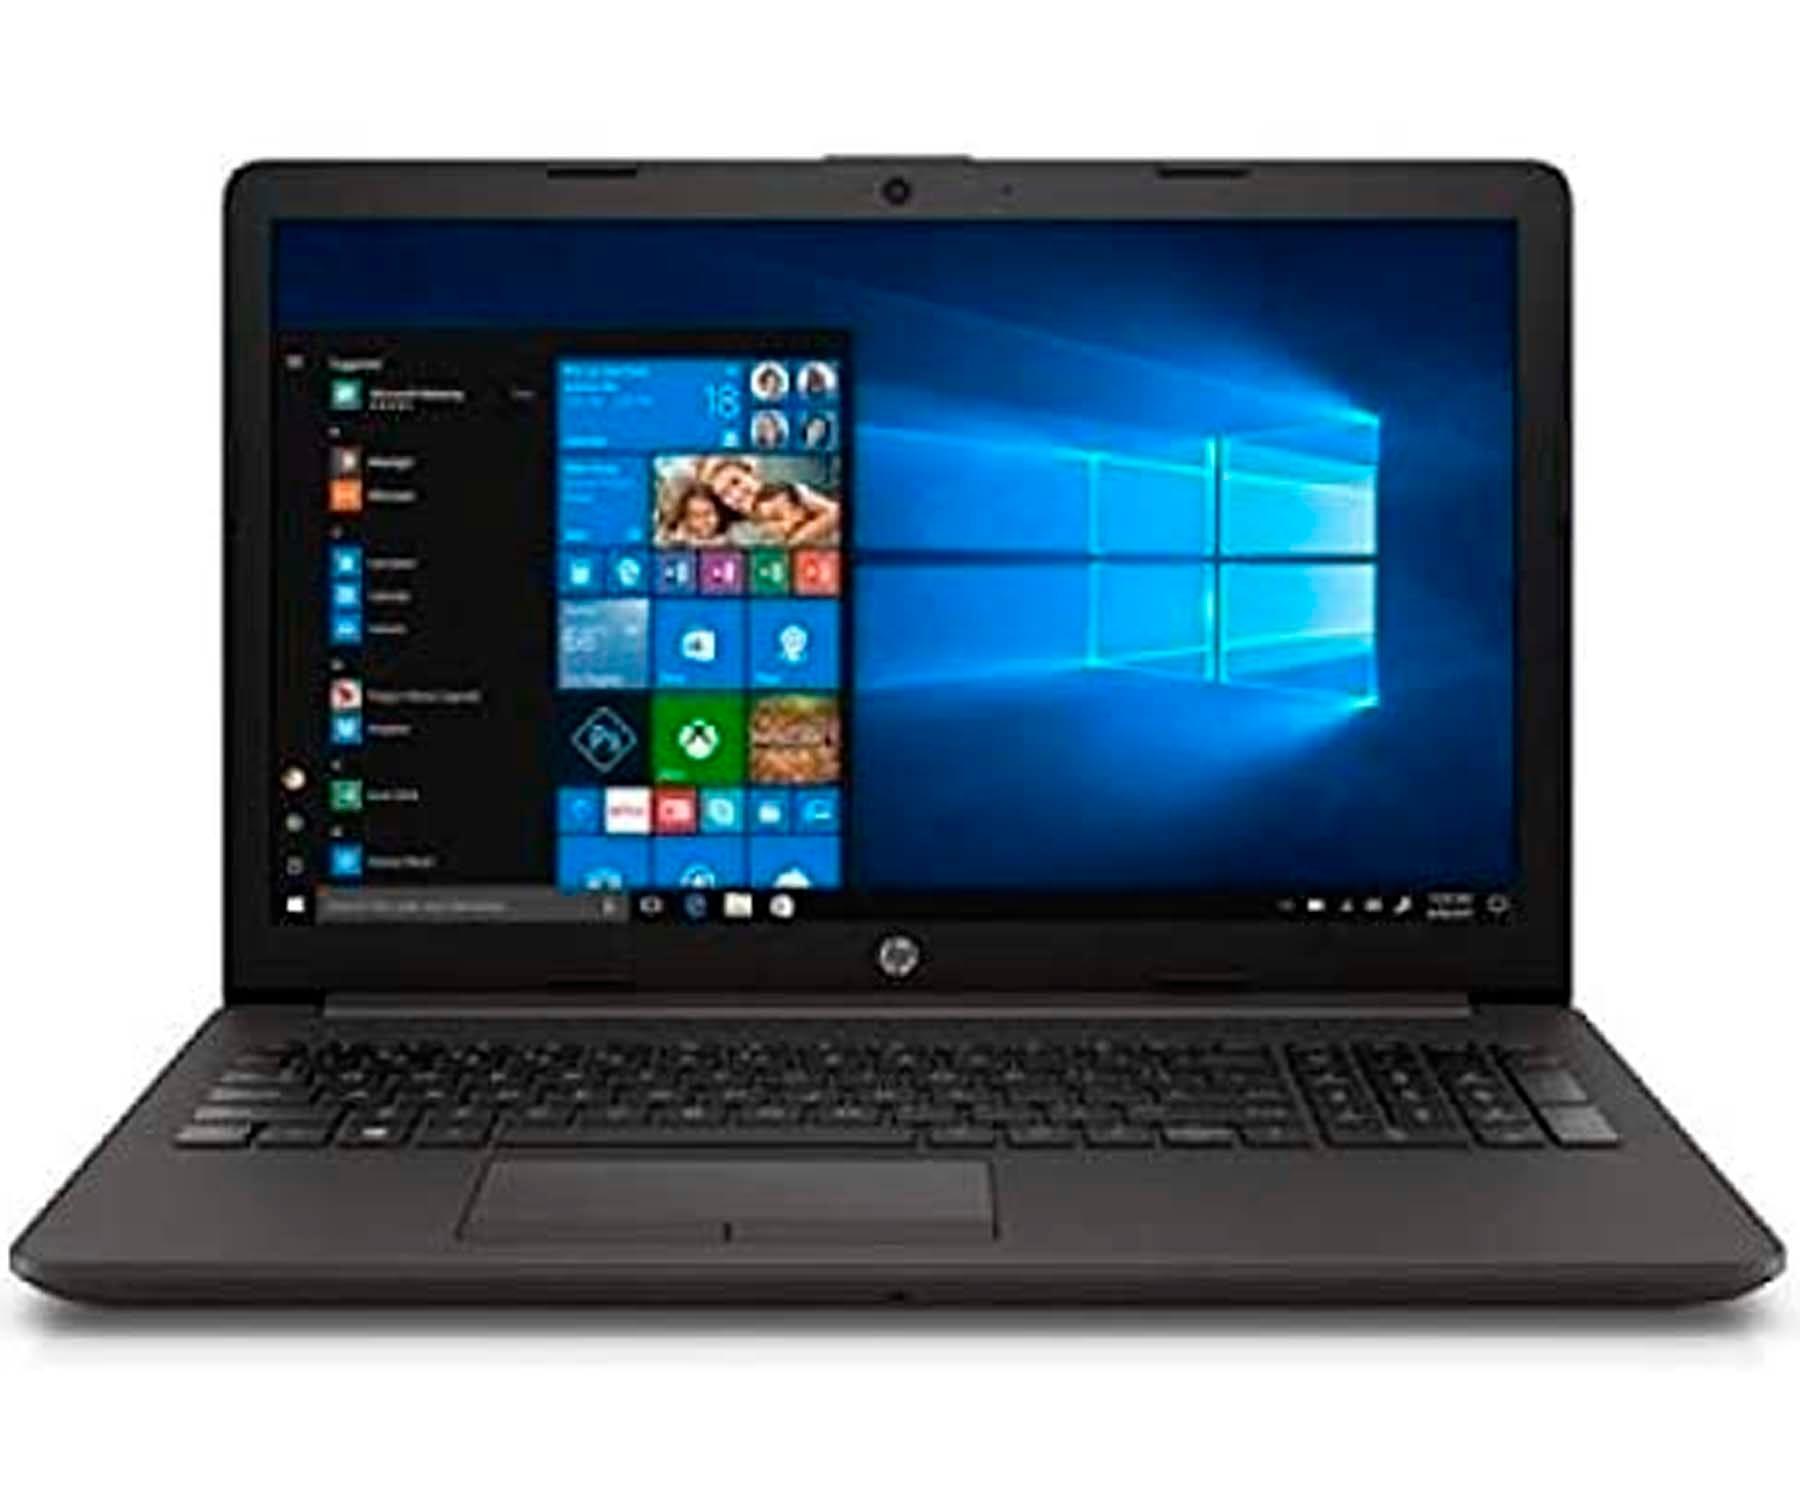 HP NOTEBOOK 255 G7 NEGRO PORTÁTIL 15.6'' HD AMD RYZEN 3 256GB SSD 8GB RAM WINDOWS 10 HOME